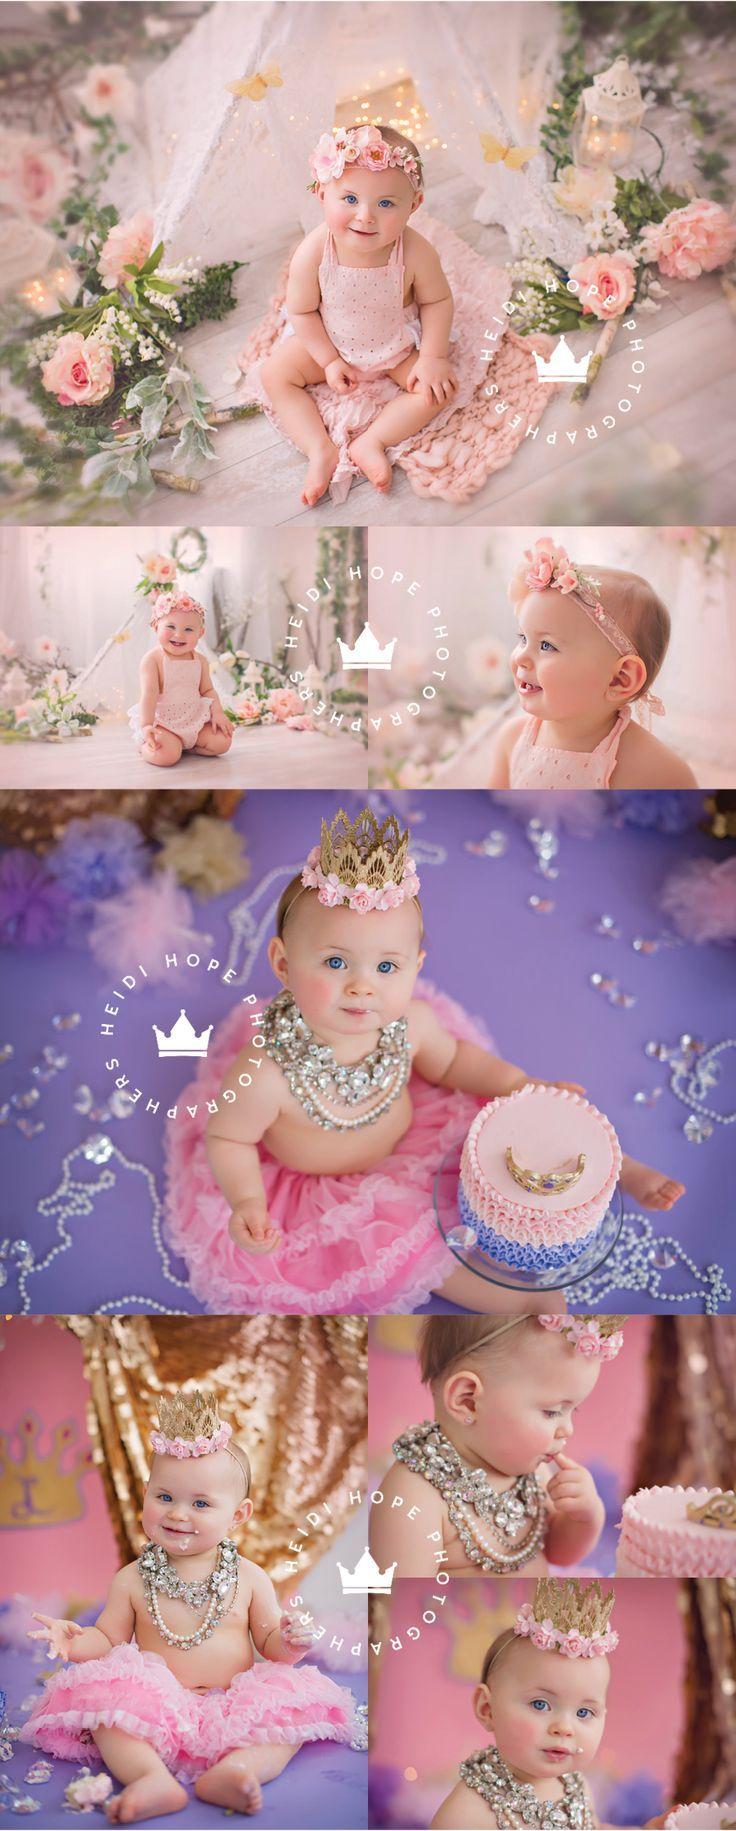 Princess L's Royal First Birthday Cake Smash! Heidi Hope